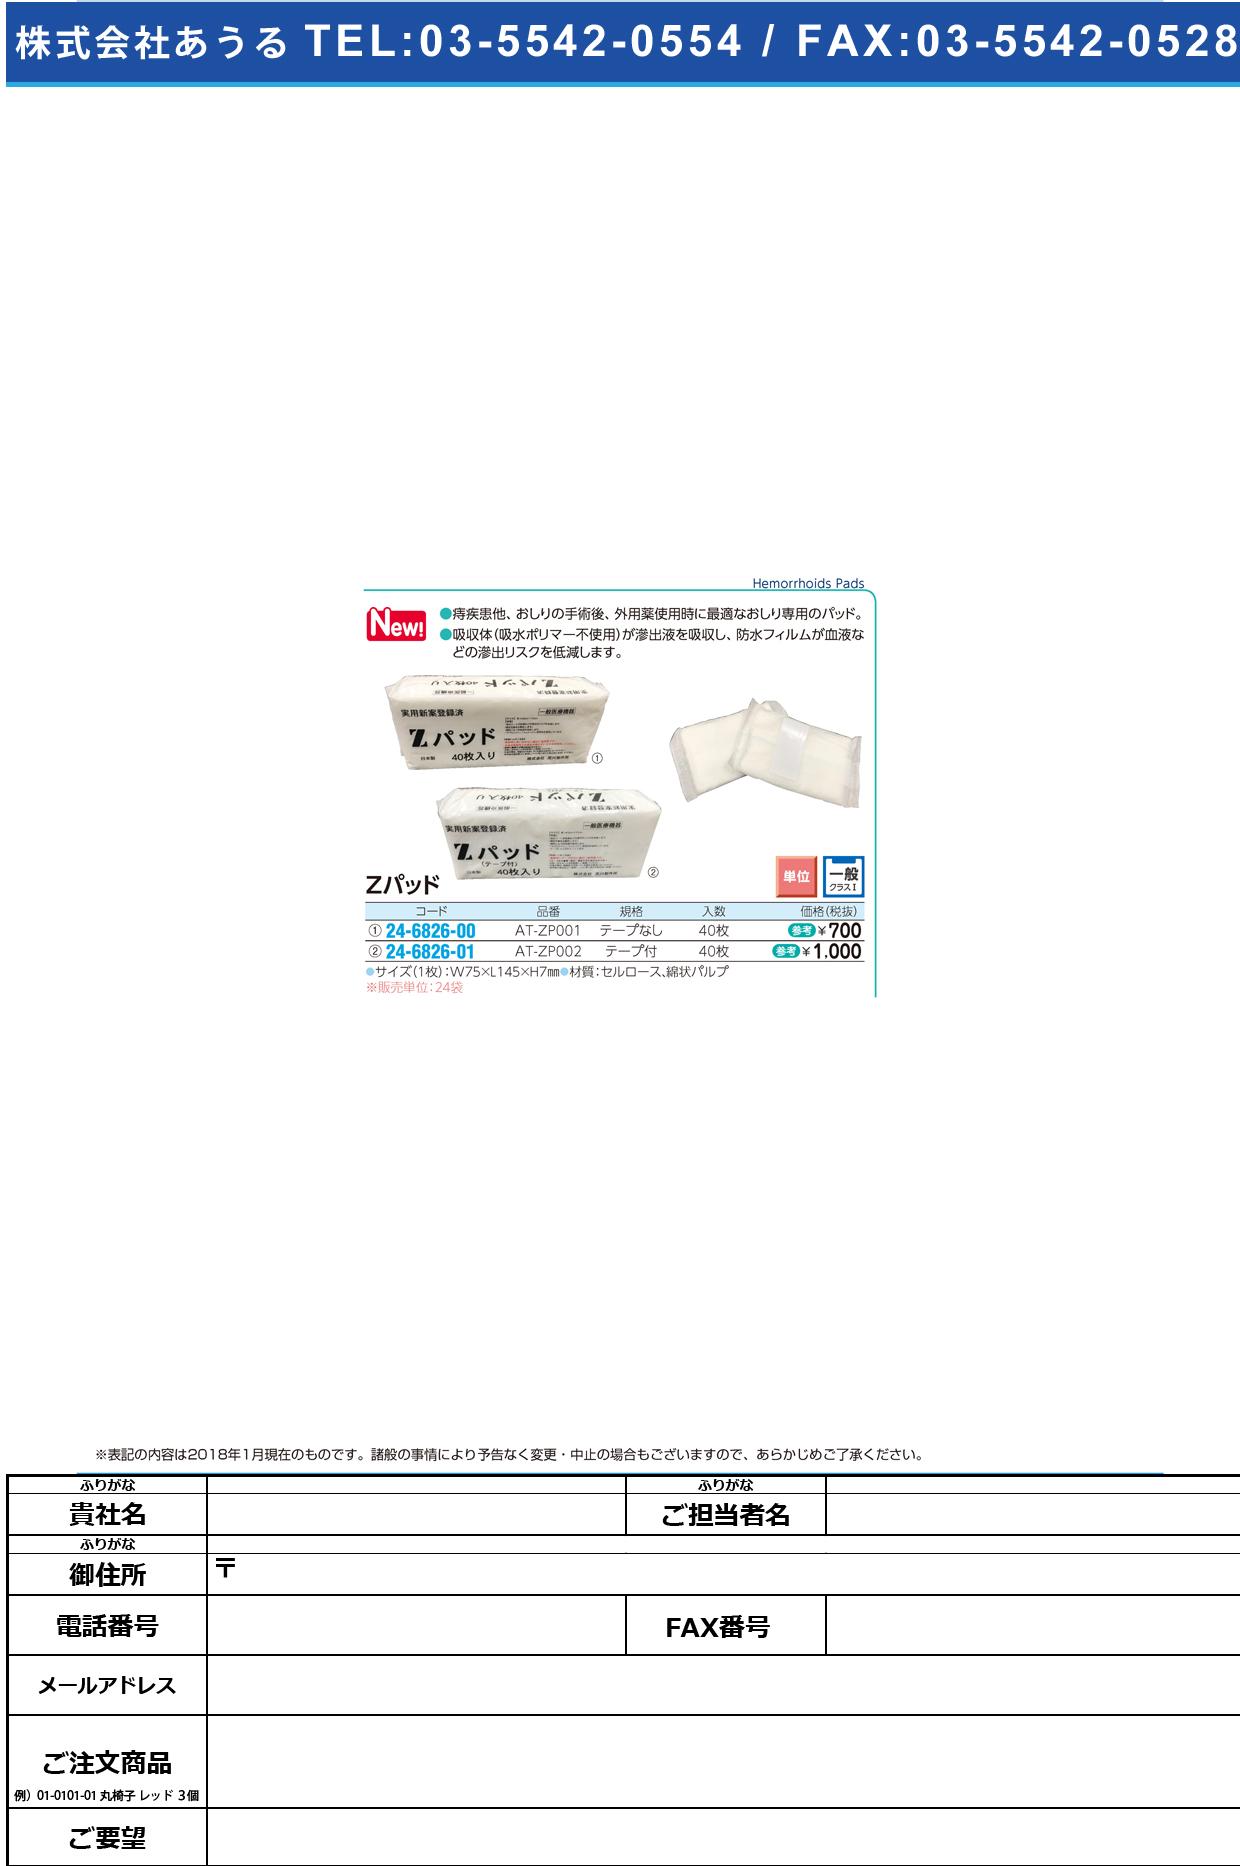 (24-6826-01)Zパッド(テープ付) AT-ZP002(40マイ) ゼットパッド(テープツキ)【24袋単位】【2018年カタログ商品】